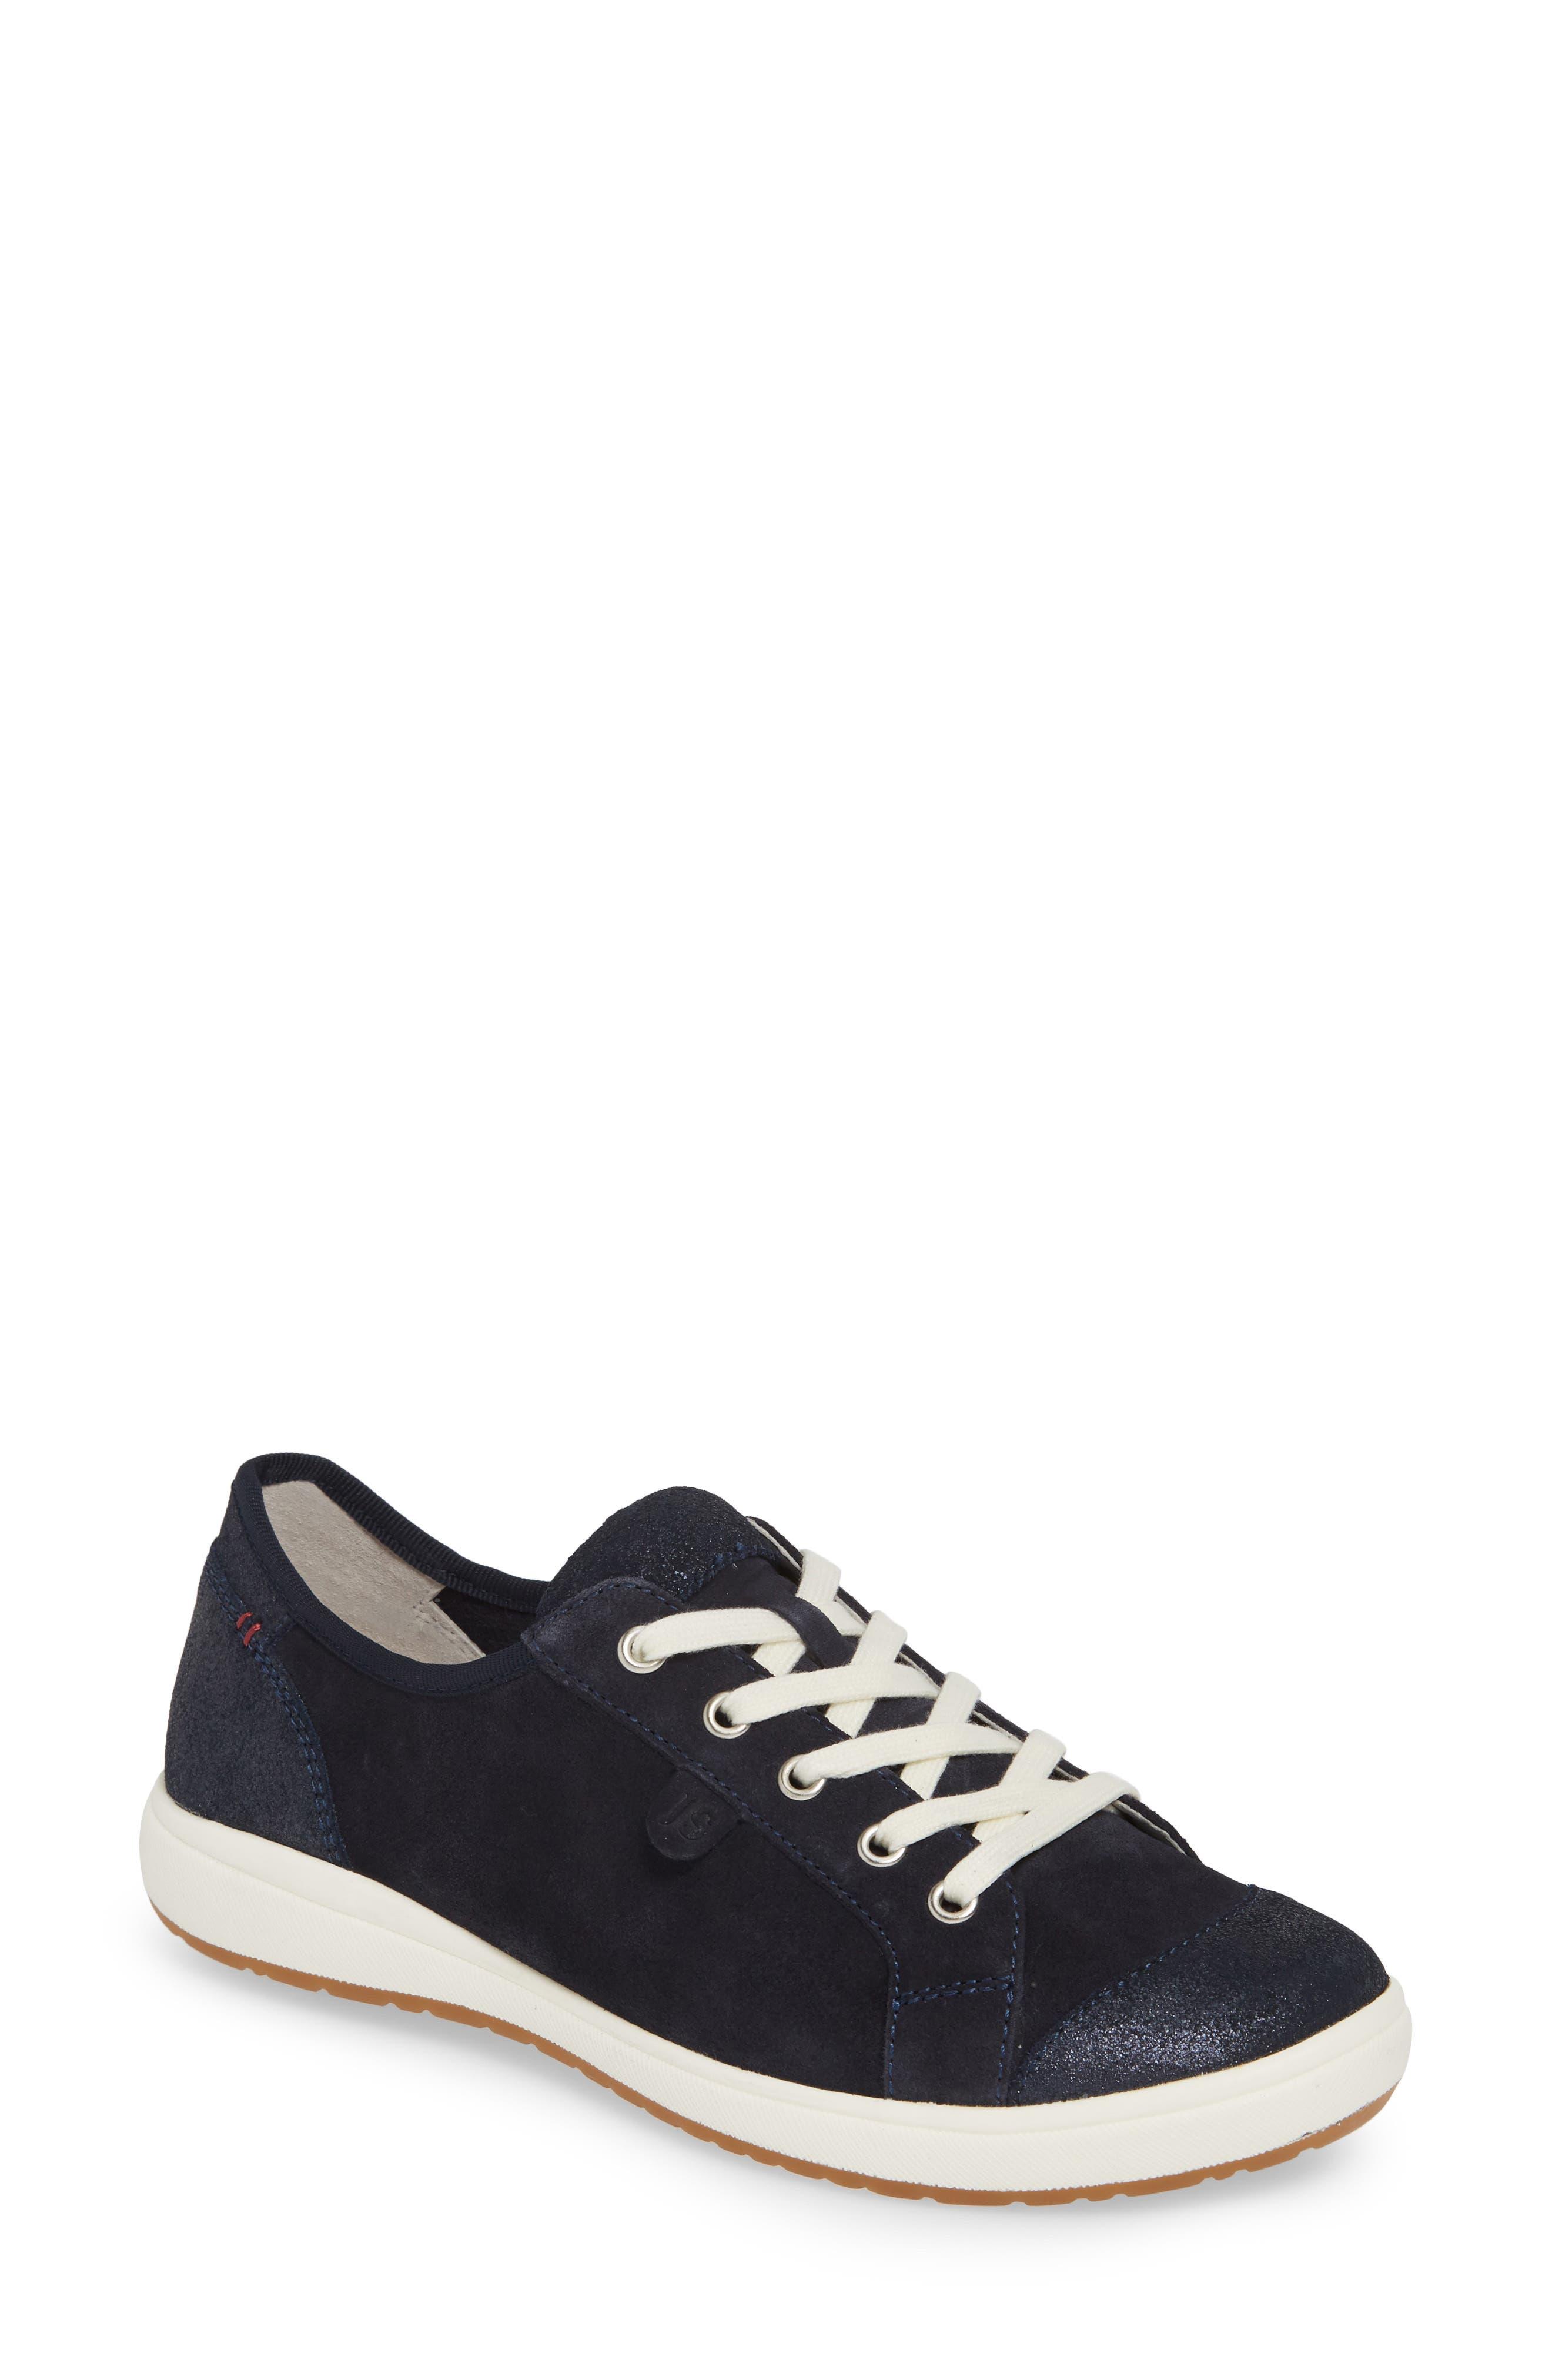 Josef Seibel Caren 08 Sneaker, Blue